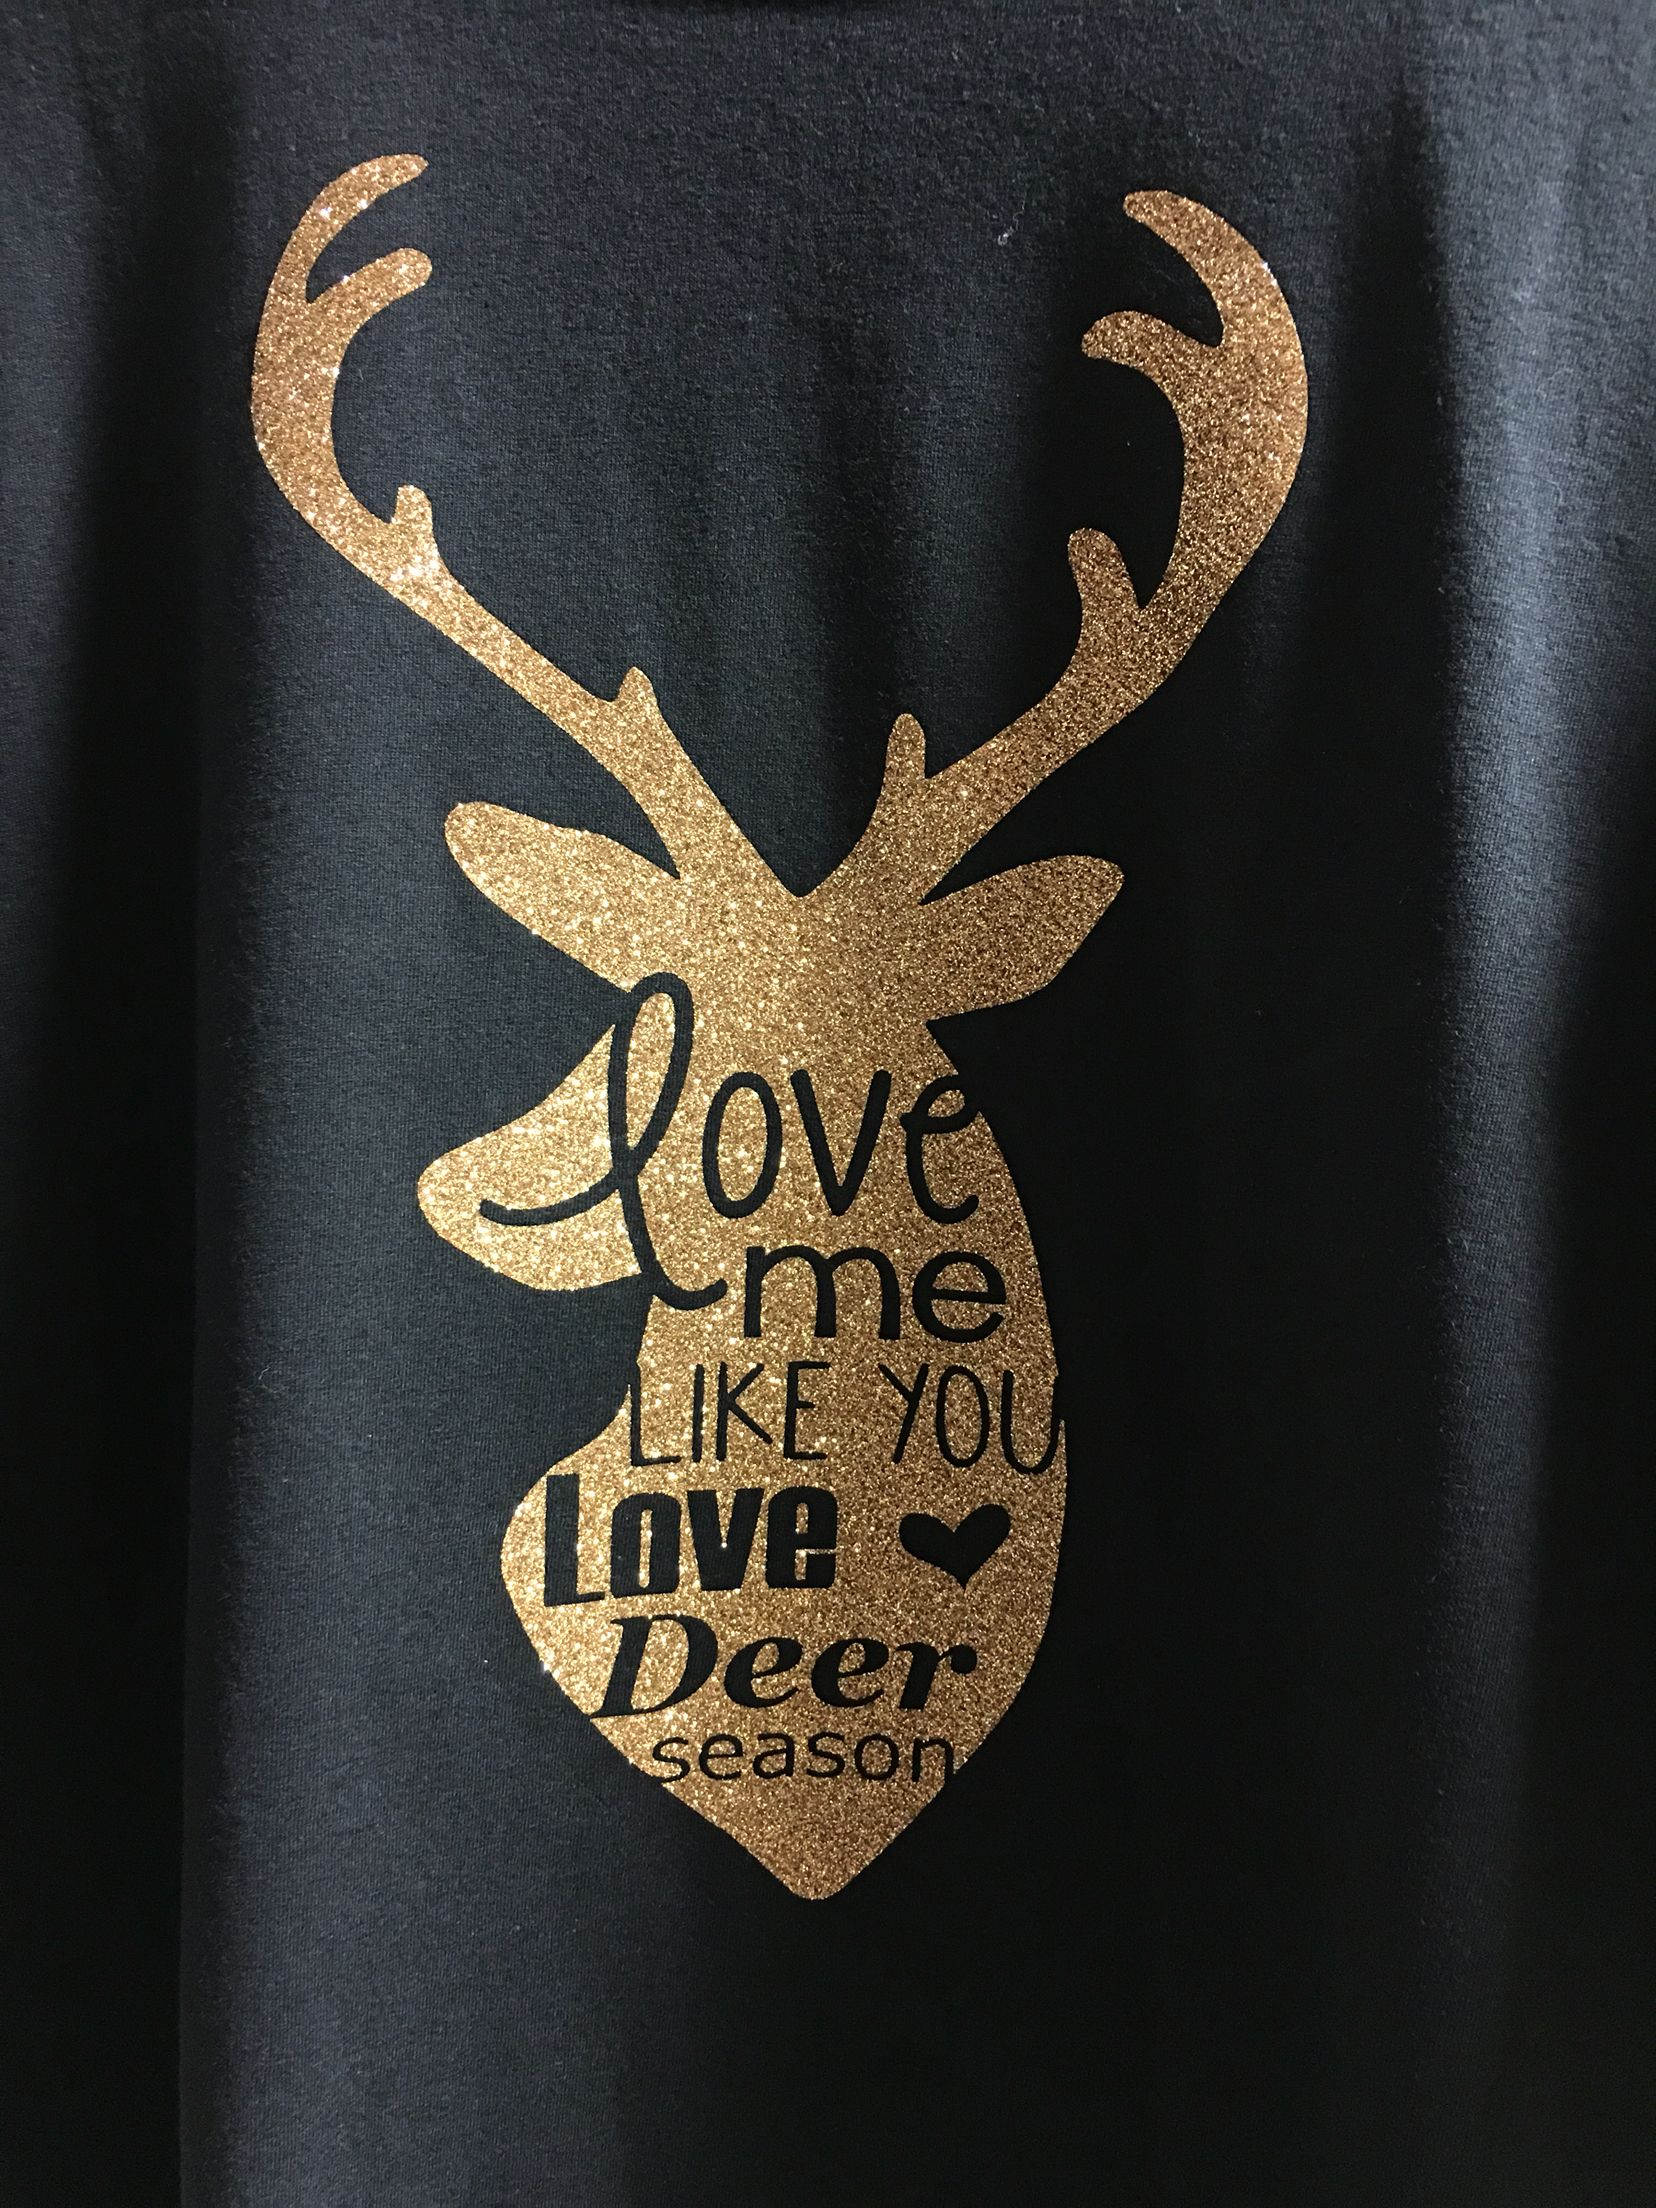 Love Me Like You Love Deer Season Vinyl Heat Transfer Gold Glitter - Custom vinyl decals machine for shirts